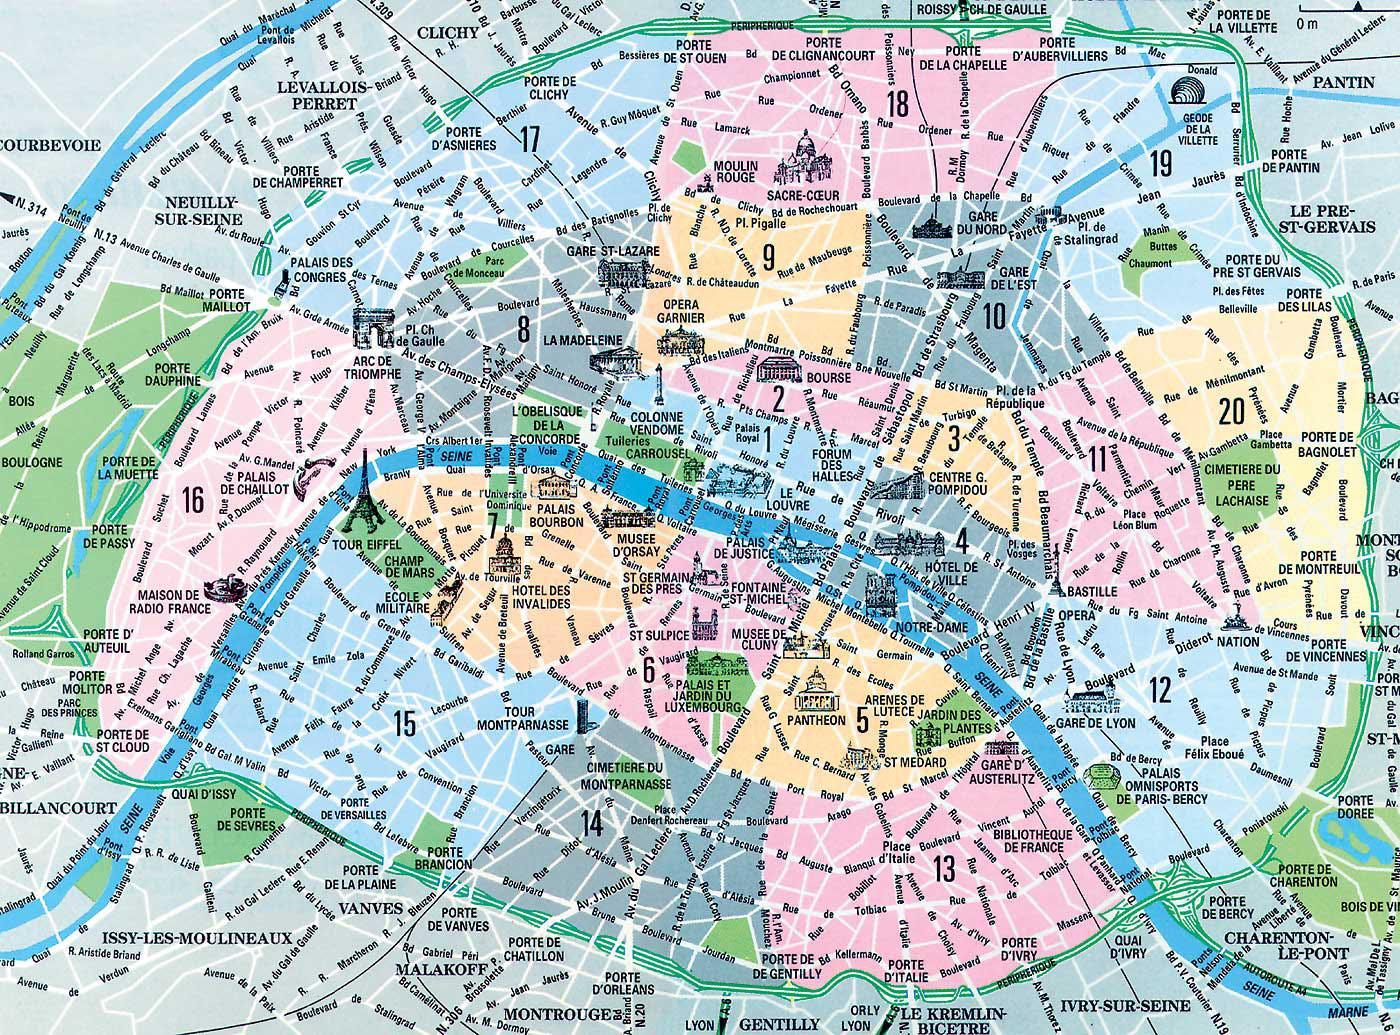 Kort Paris Arrondissement Kort Af Arrondissement I Paris